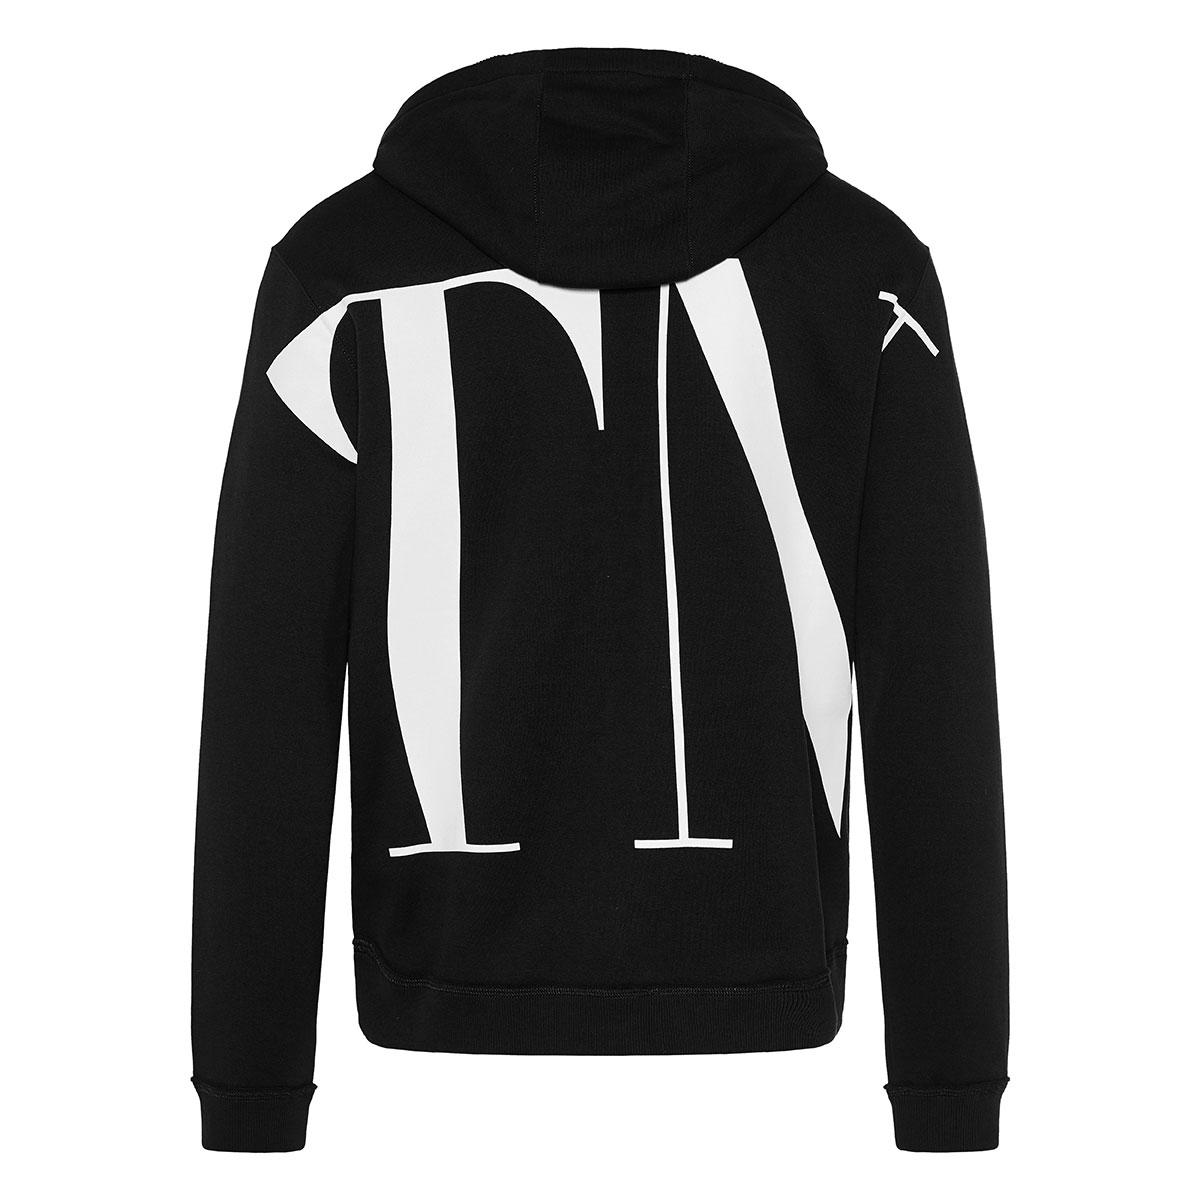 VLTN zipper hoodie